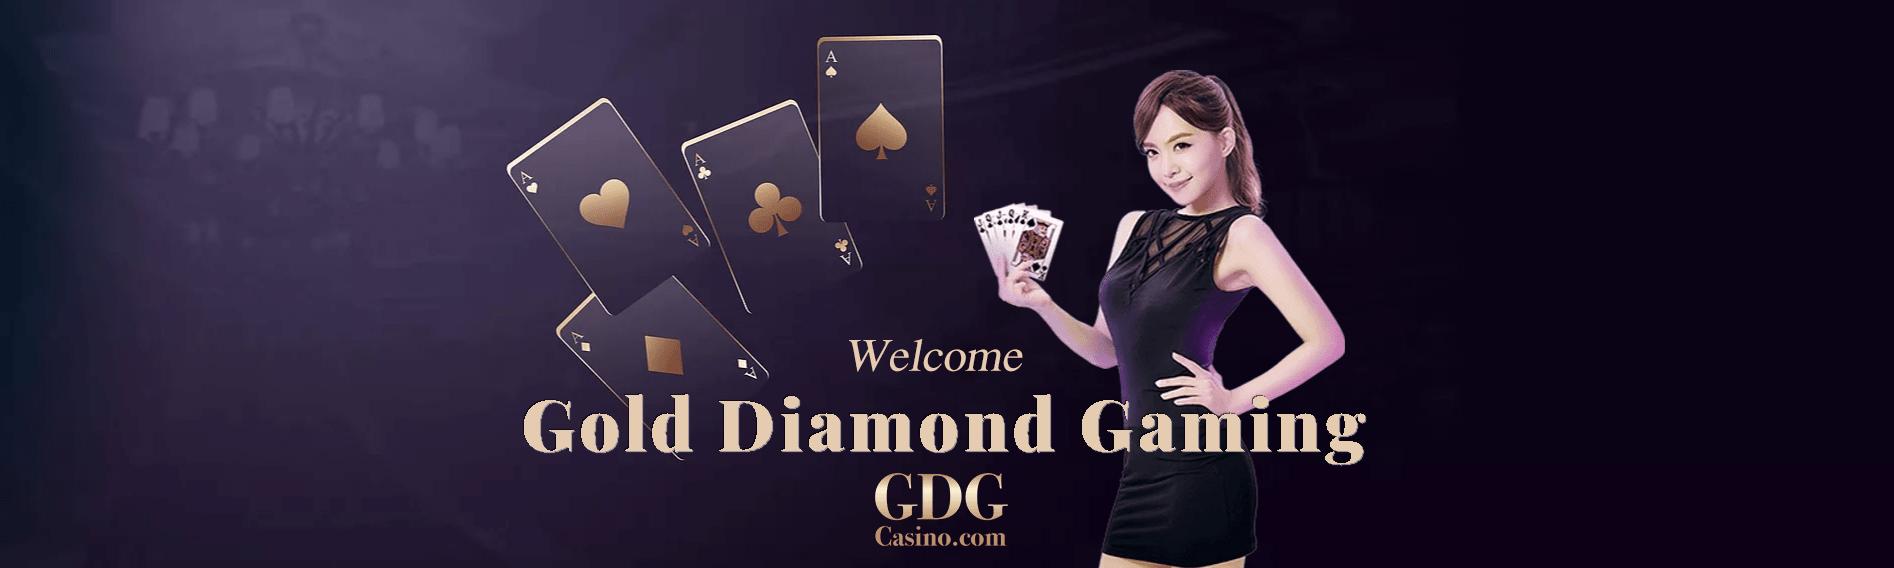 welcome-to-GDGCasino